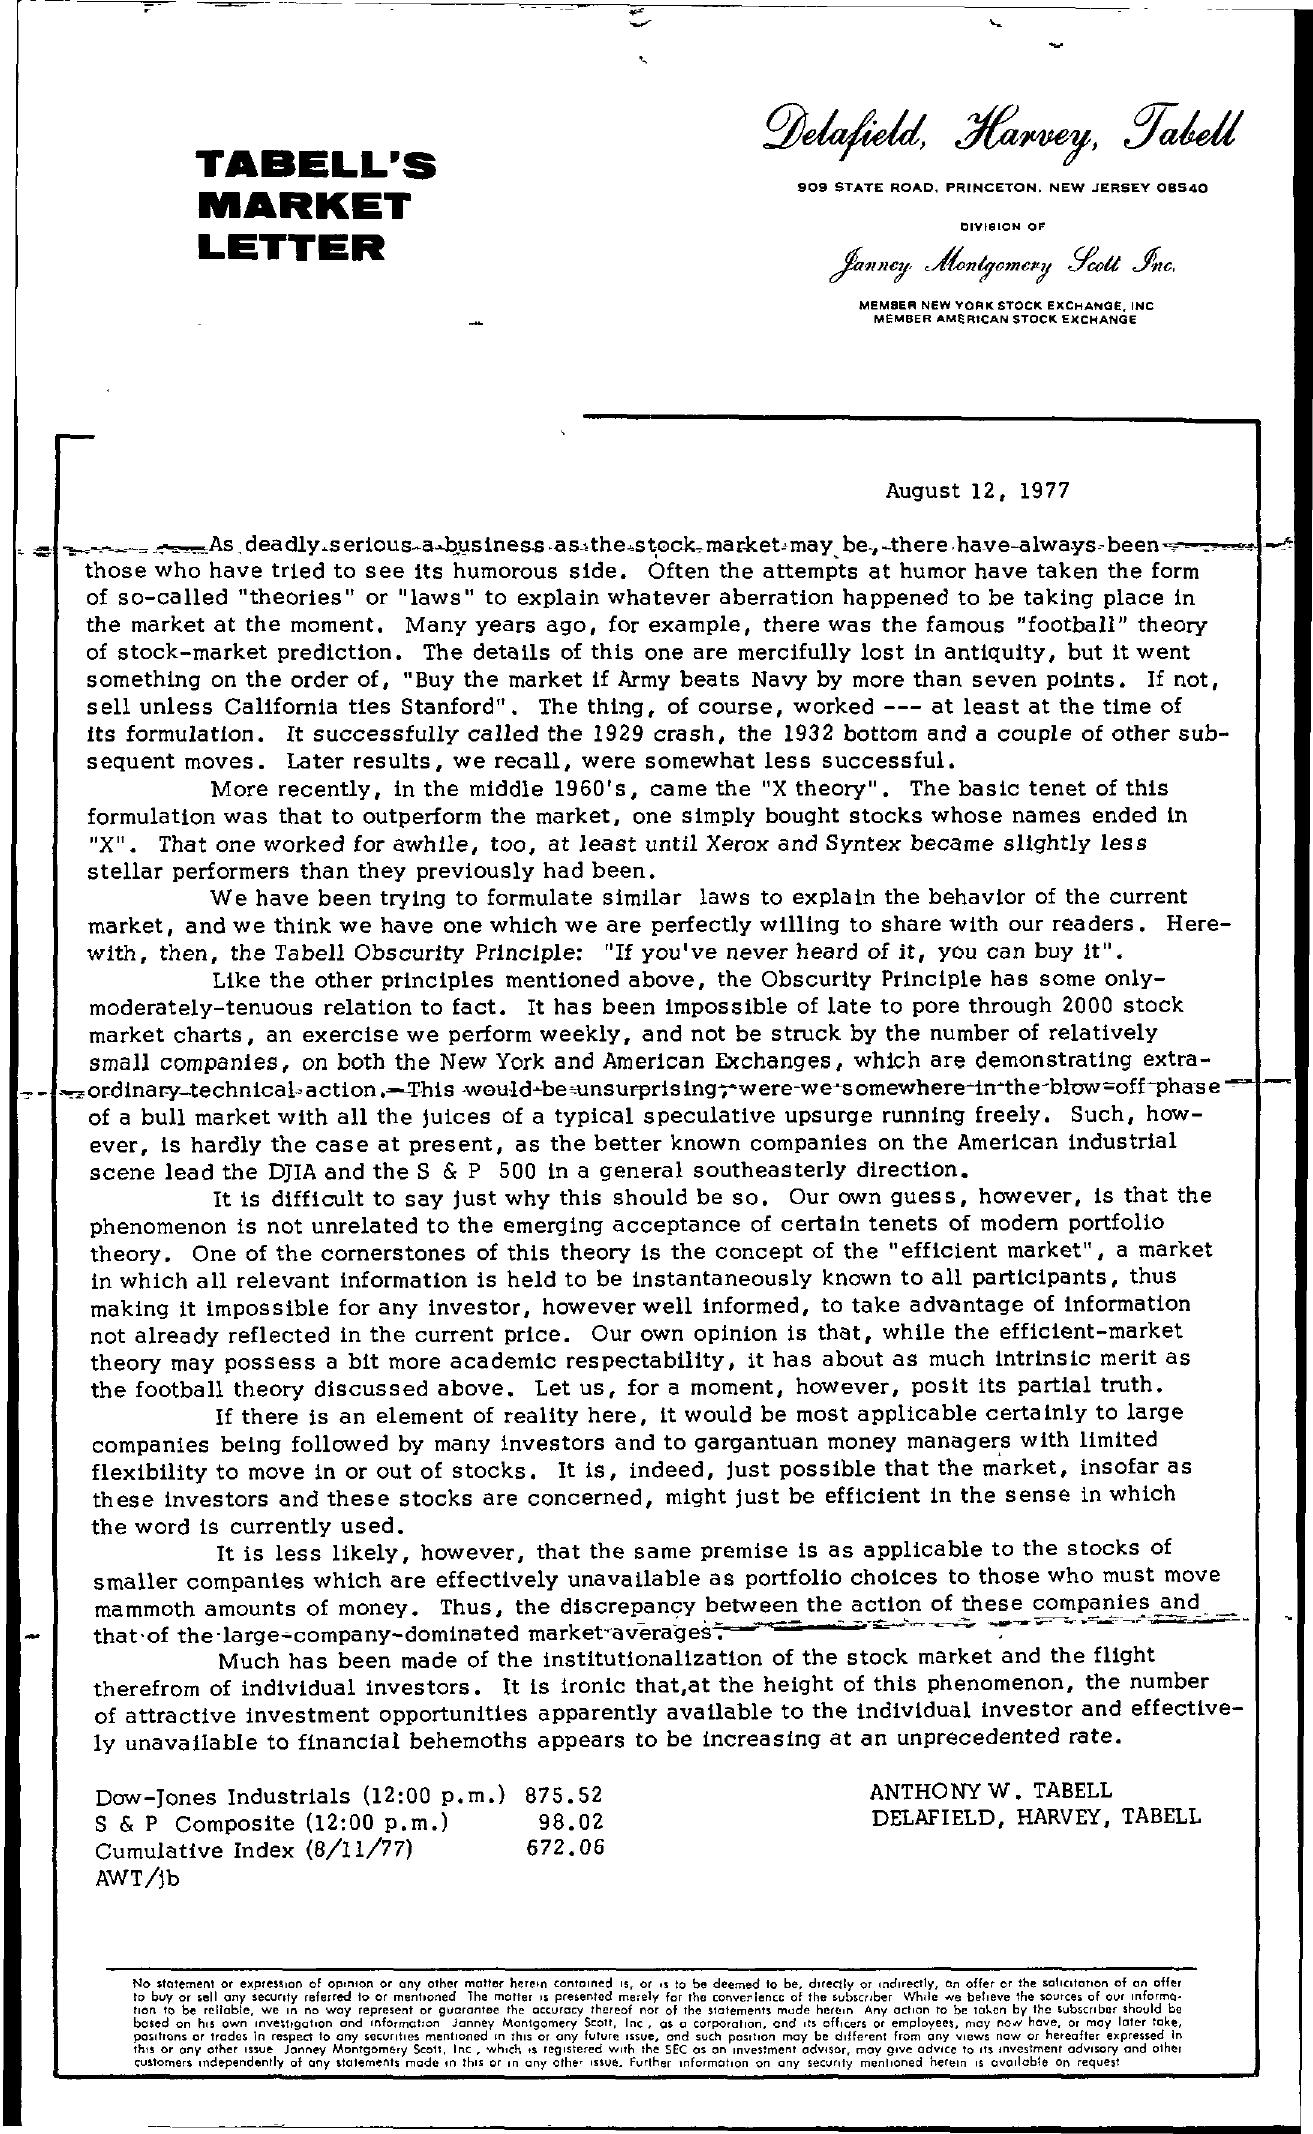 Tabell's Market Letter - August 12, 1977